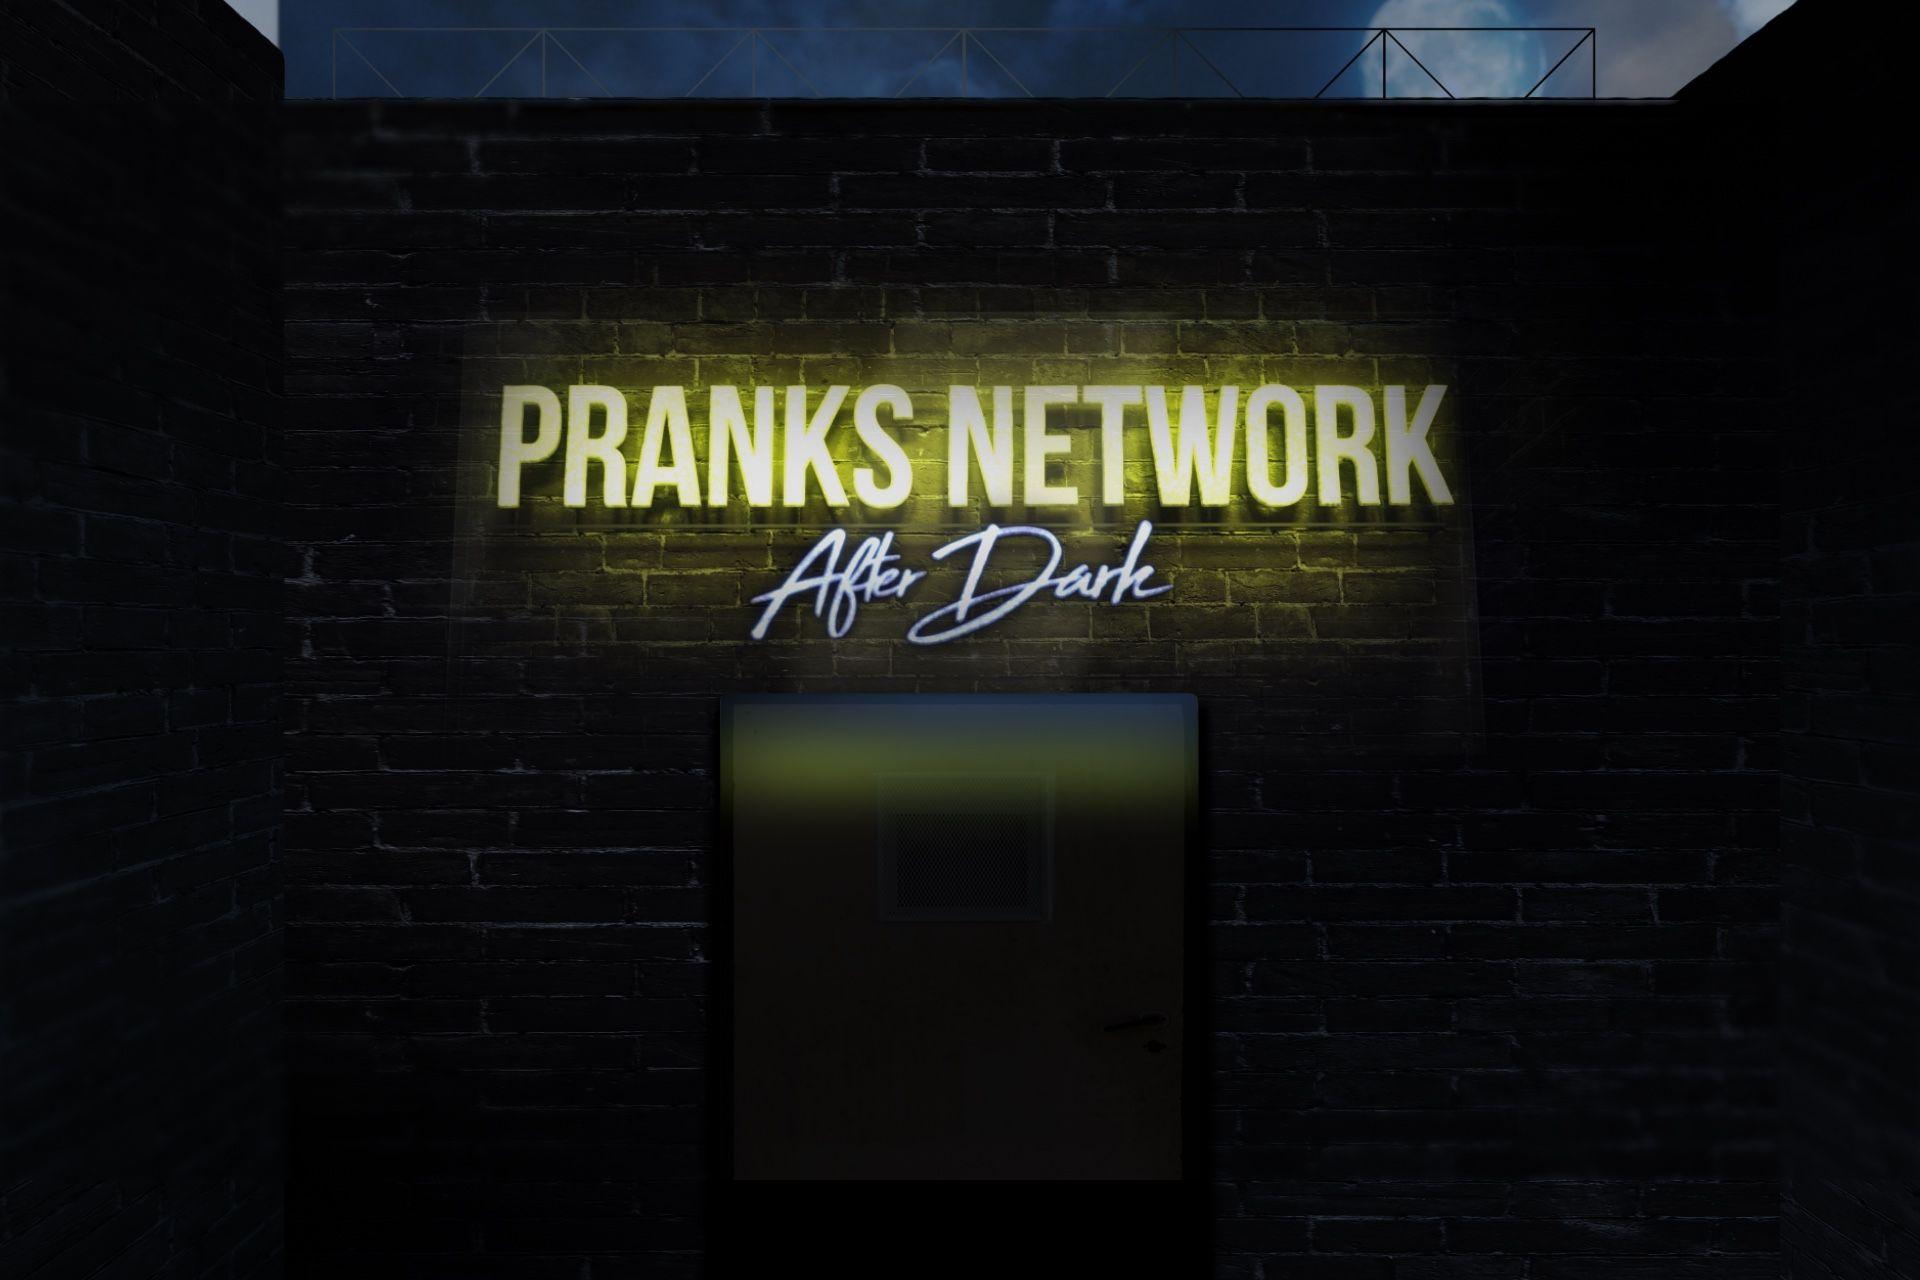 TBD - Pranks Network After Dark